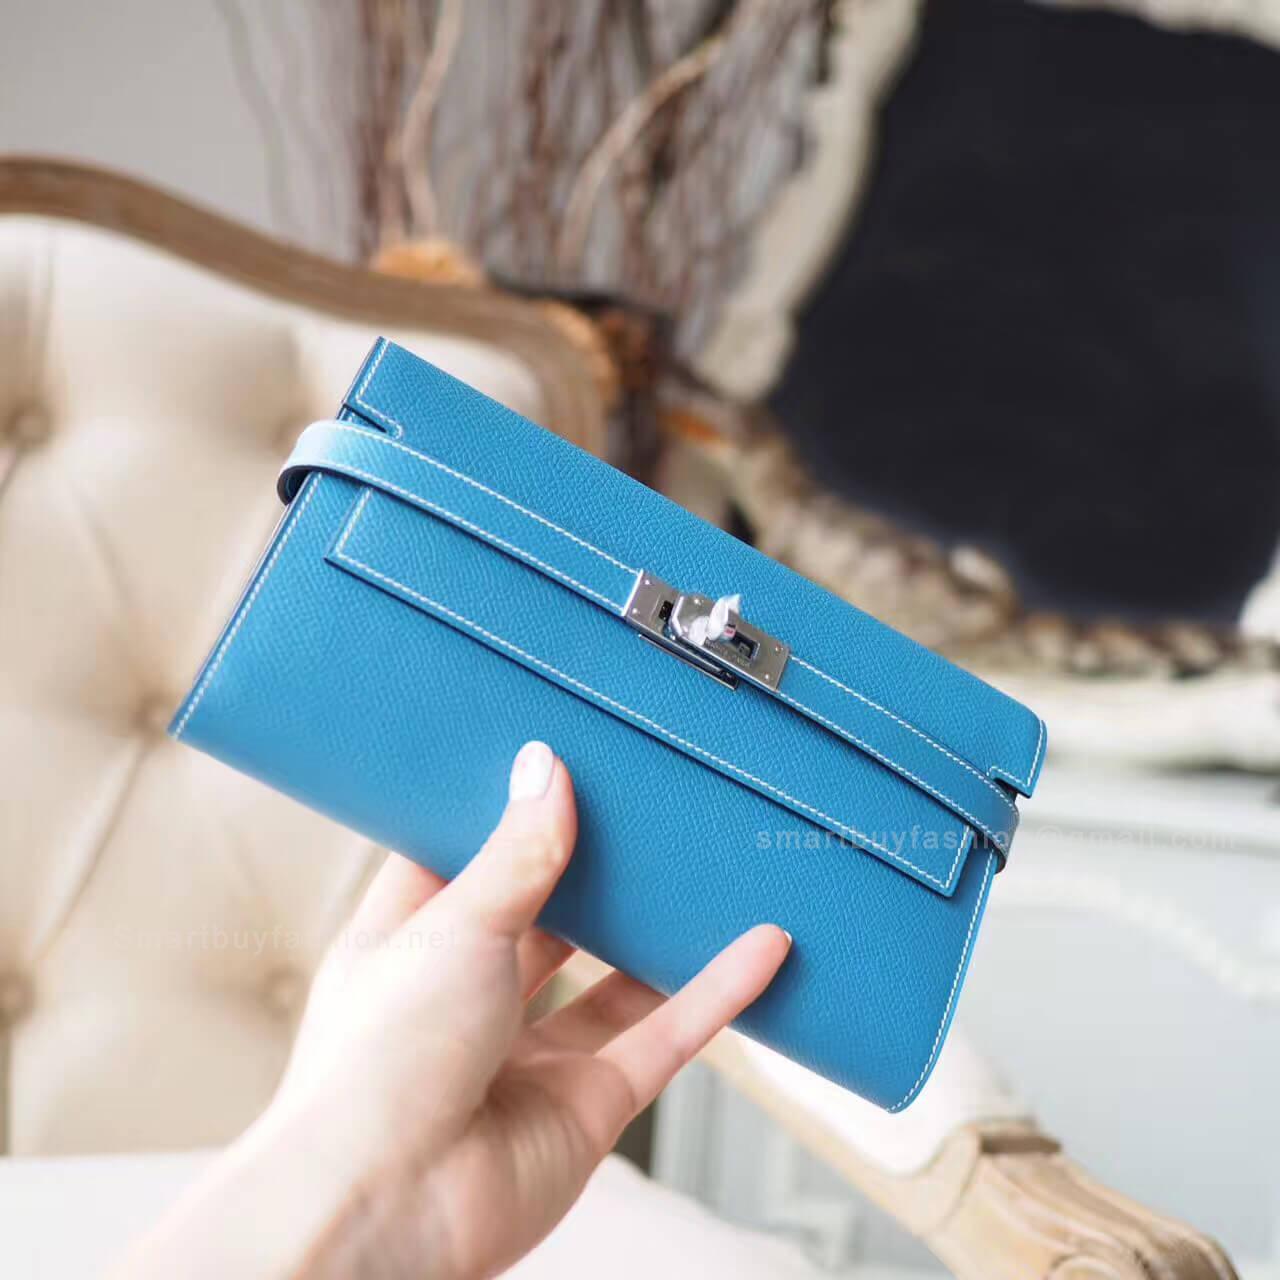 0711b4f80e011 Hermès Kelly Cut 31 - Best Copy Hermès Purses Handstitched